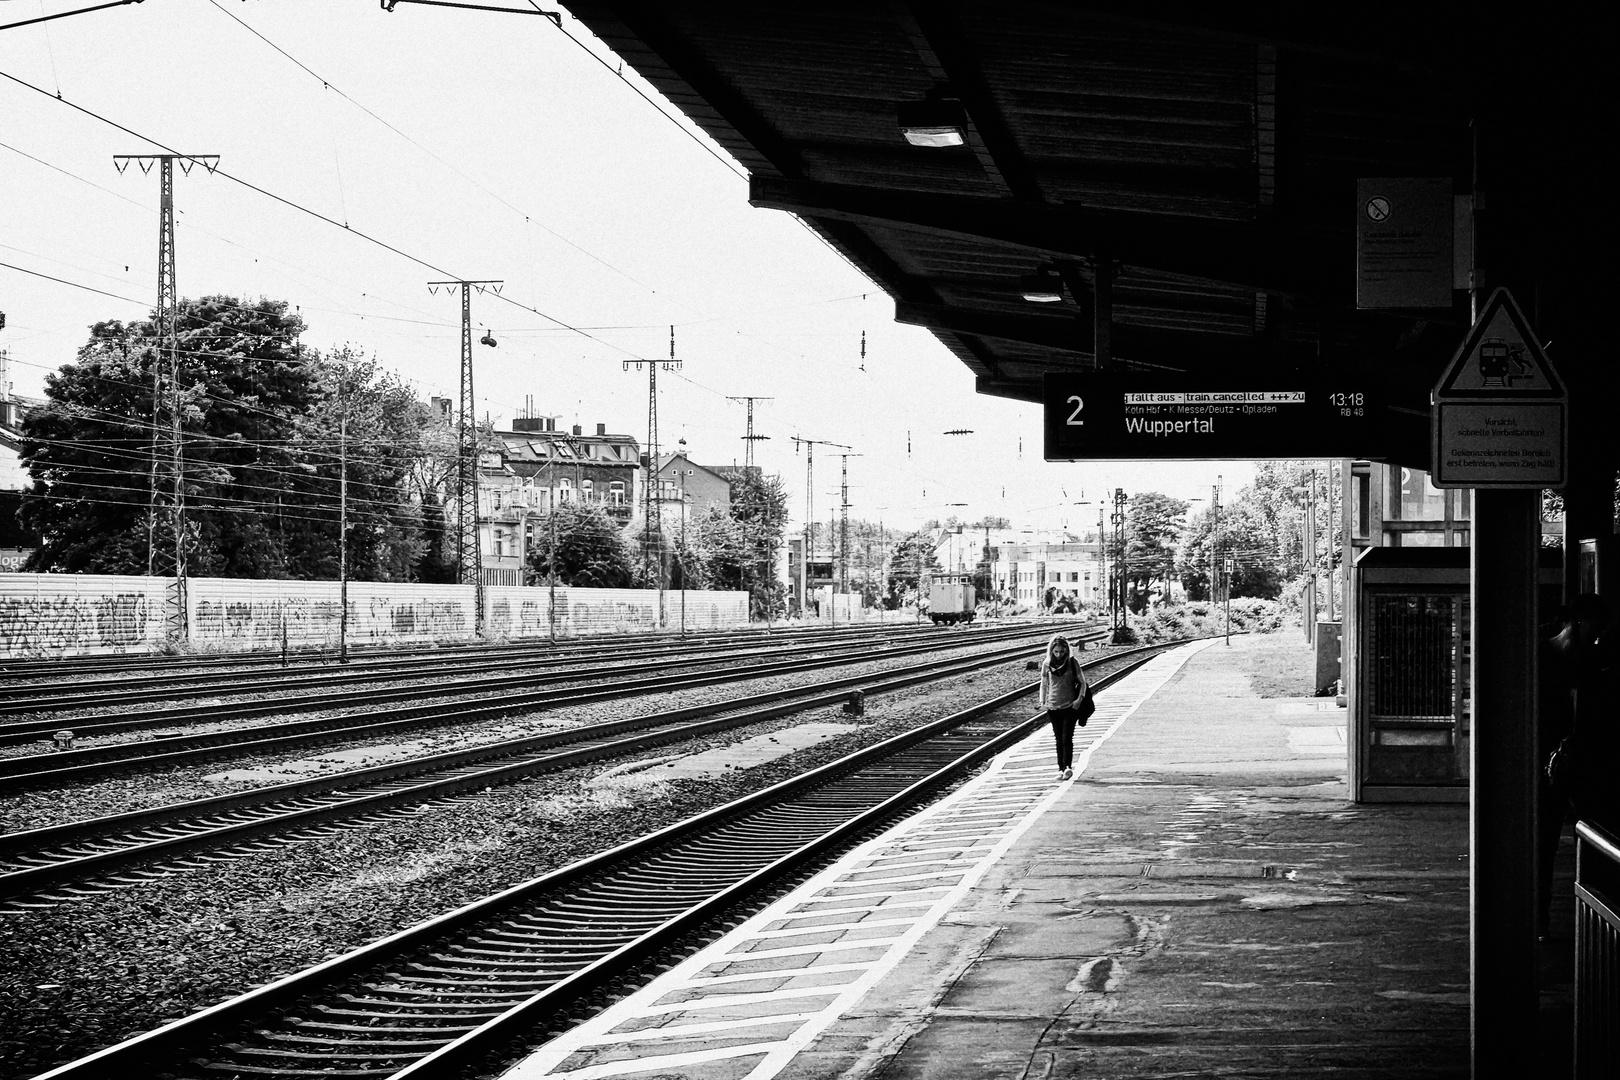 train cancelled